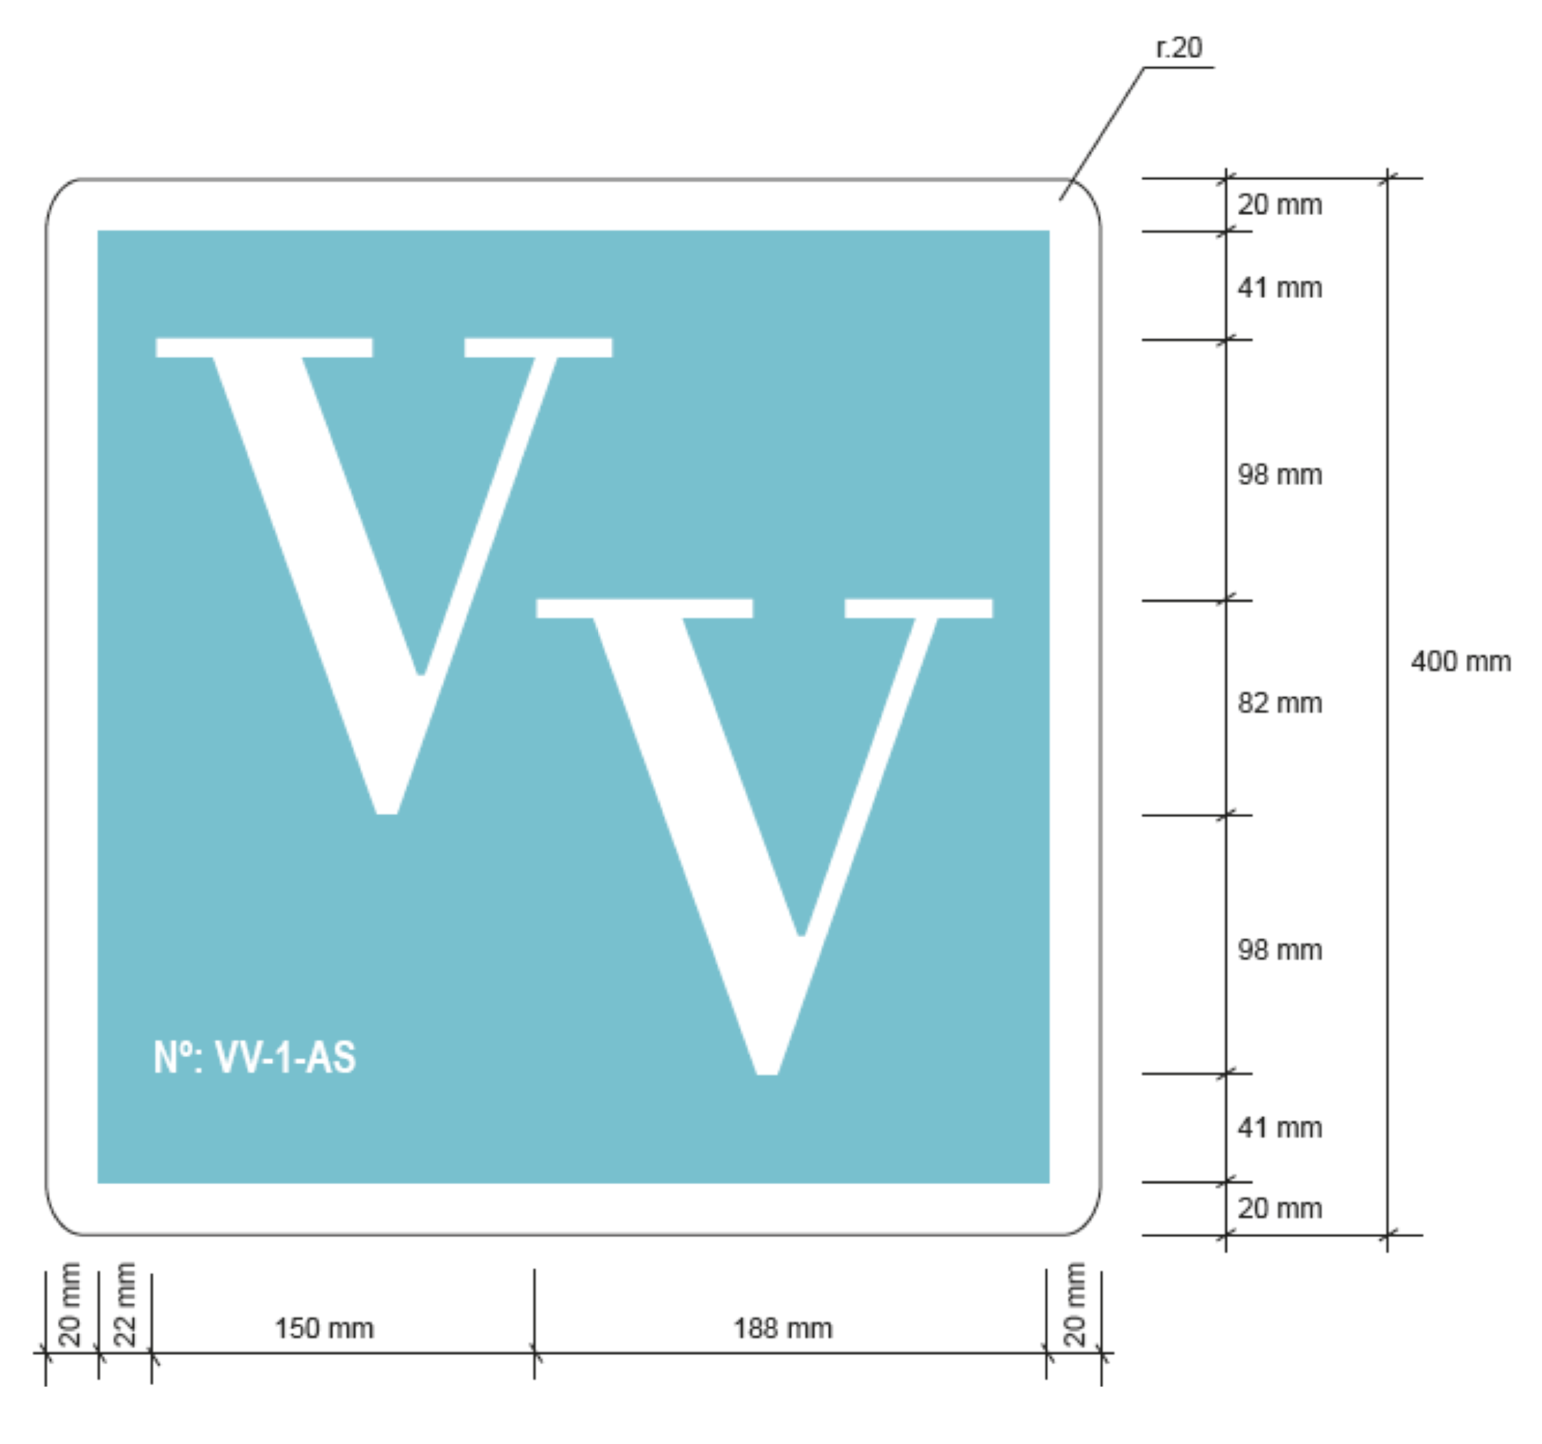 Placa identificativa · VV · Asturias